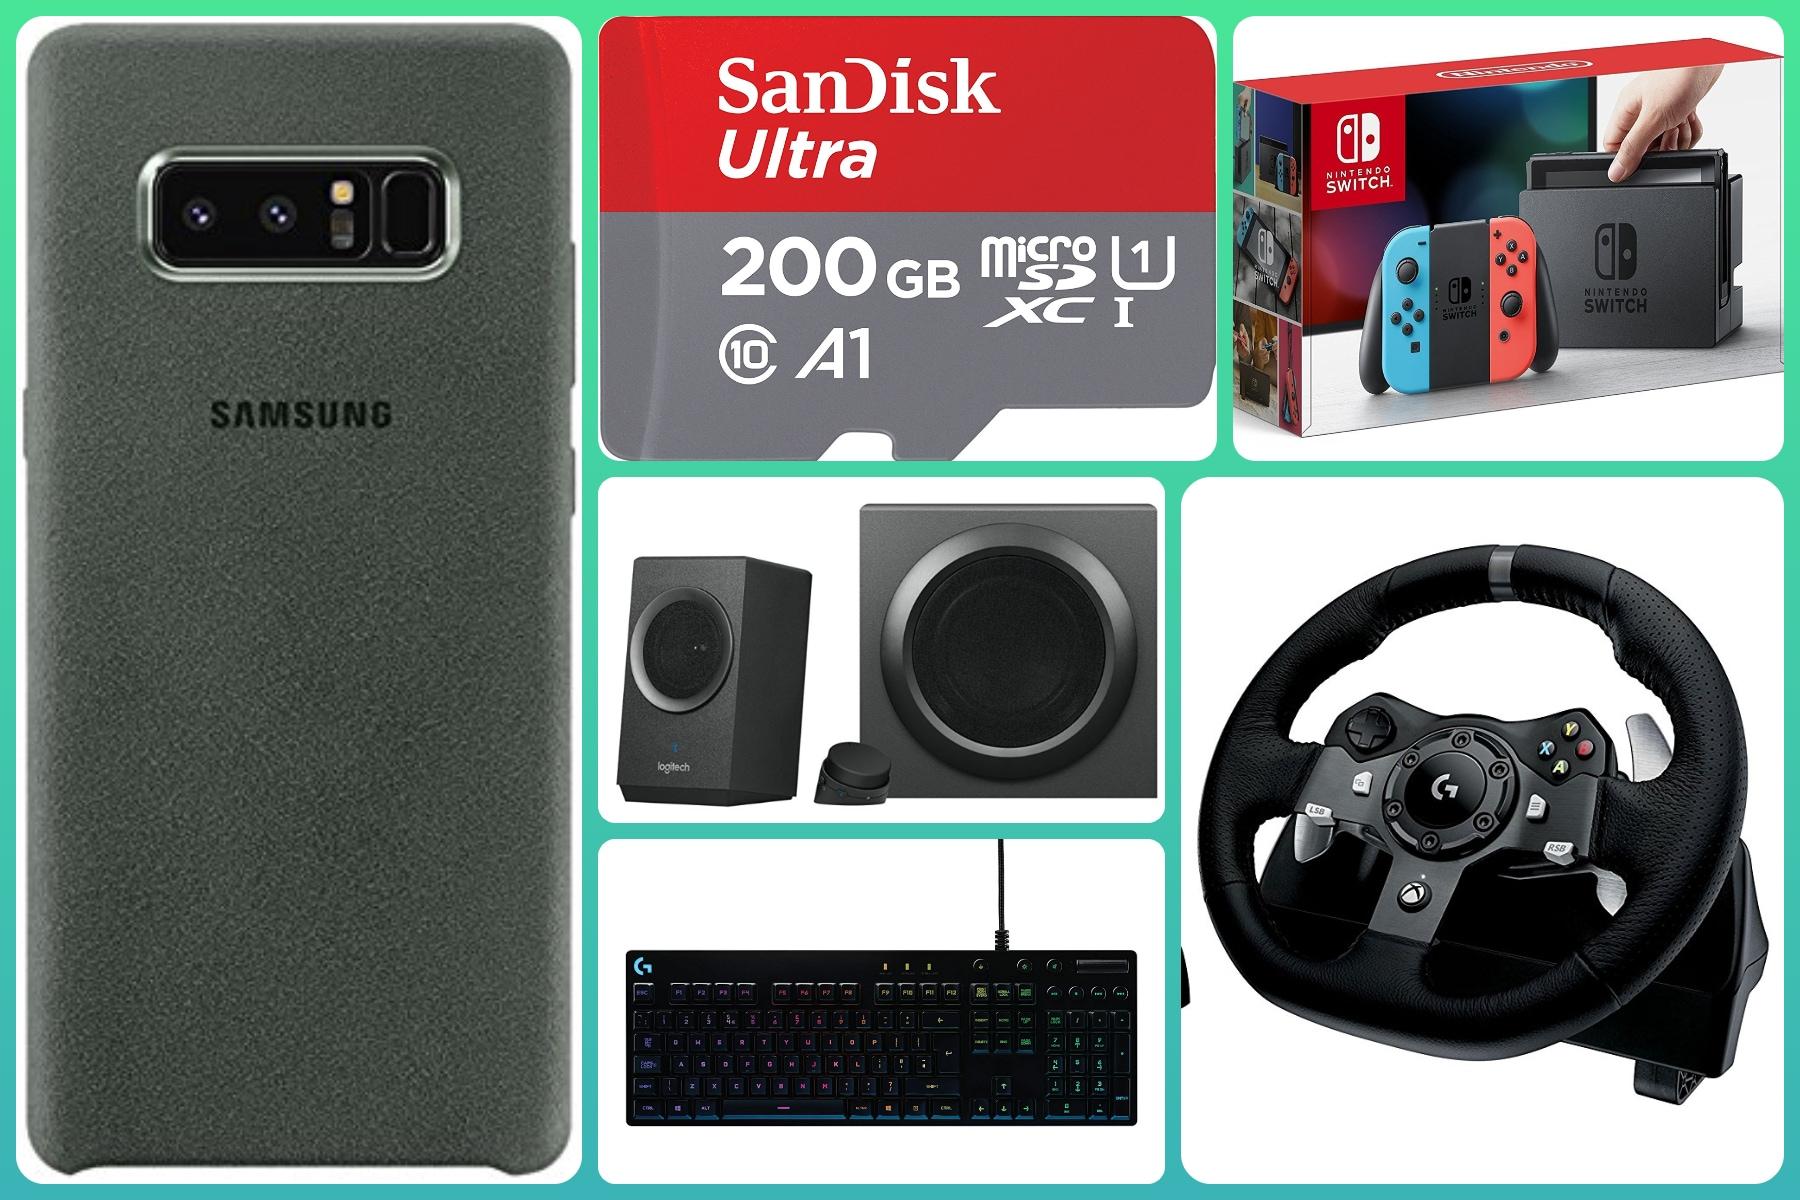 Su Amazon in offerta: Galaxy S9, power bank wireless, Hero Session, cuffie gaming - image migliori-offerte-amazon-19-marzo-2018 on http://www.zxbyte.com